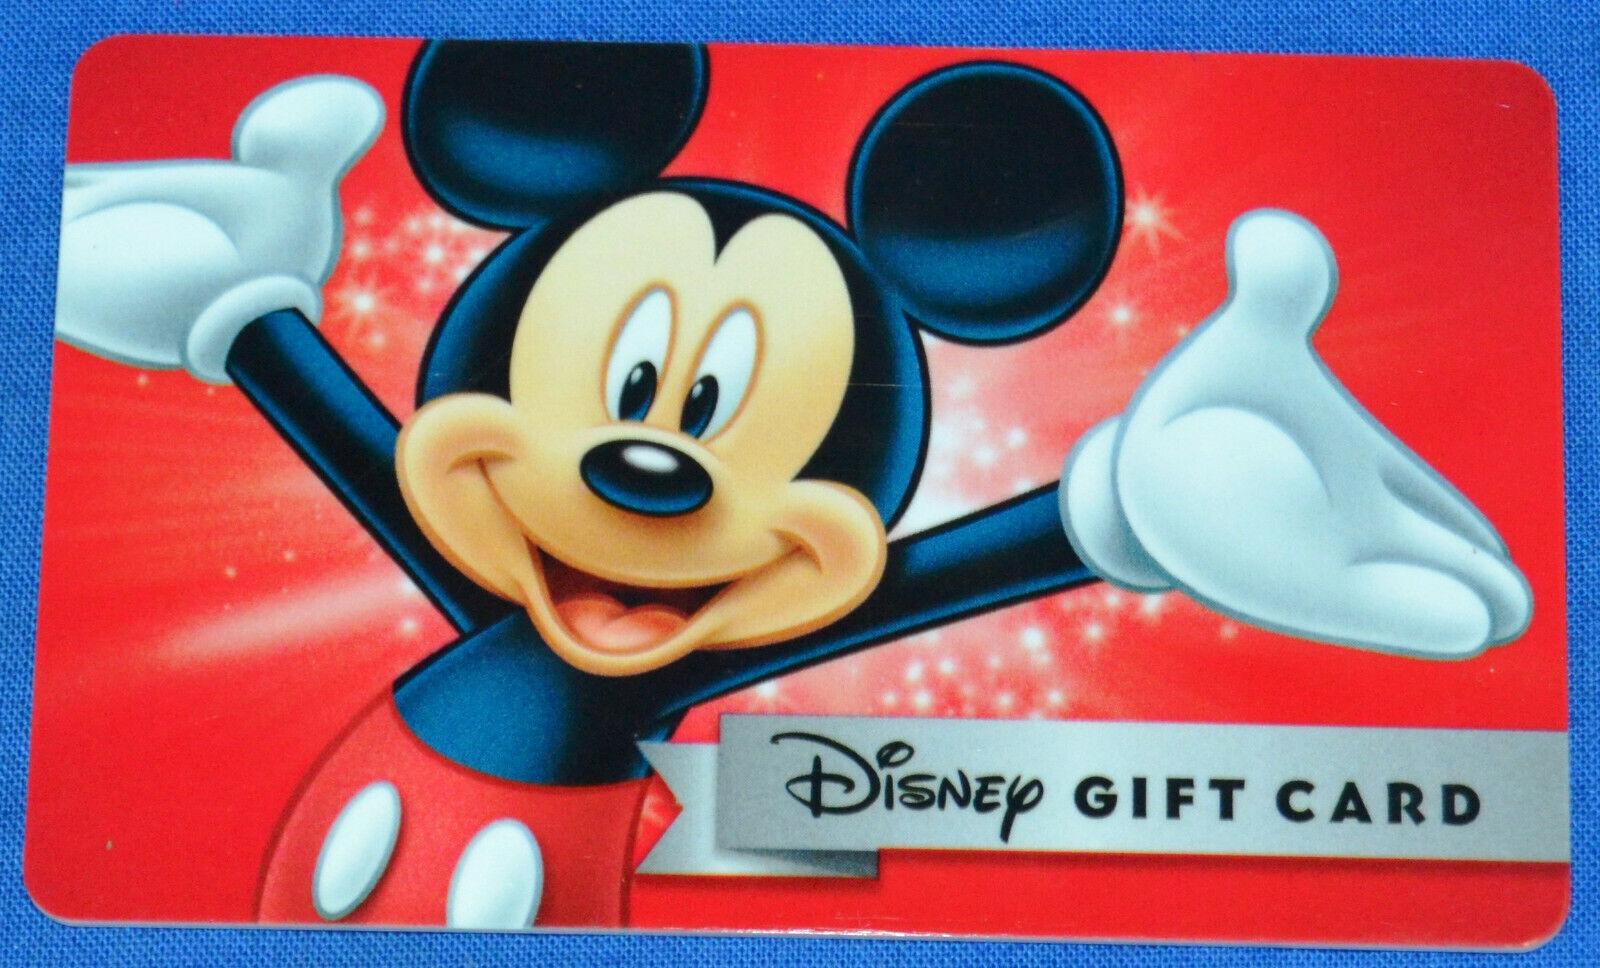 60 Disney Gift Card FREE SHIPPING - $54.99